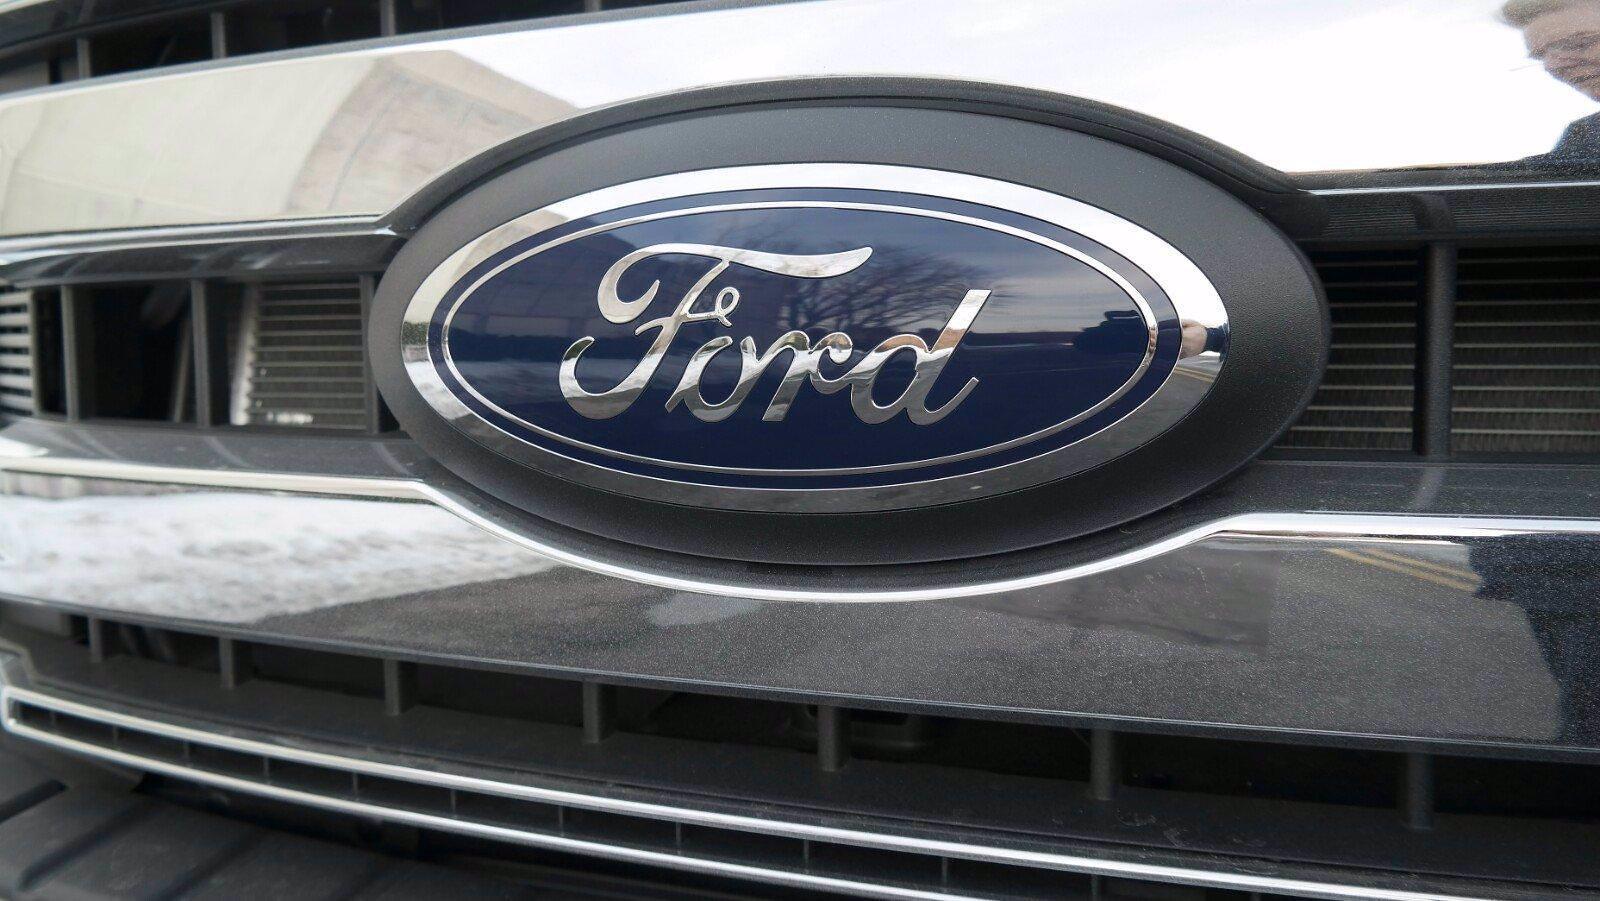 2021 Ford F-600 Regular Cab DRW 4x4, Cab Chassis #FLU10034 - photo 17